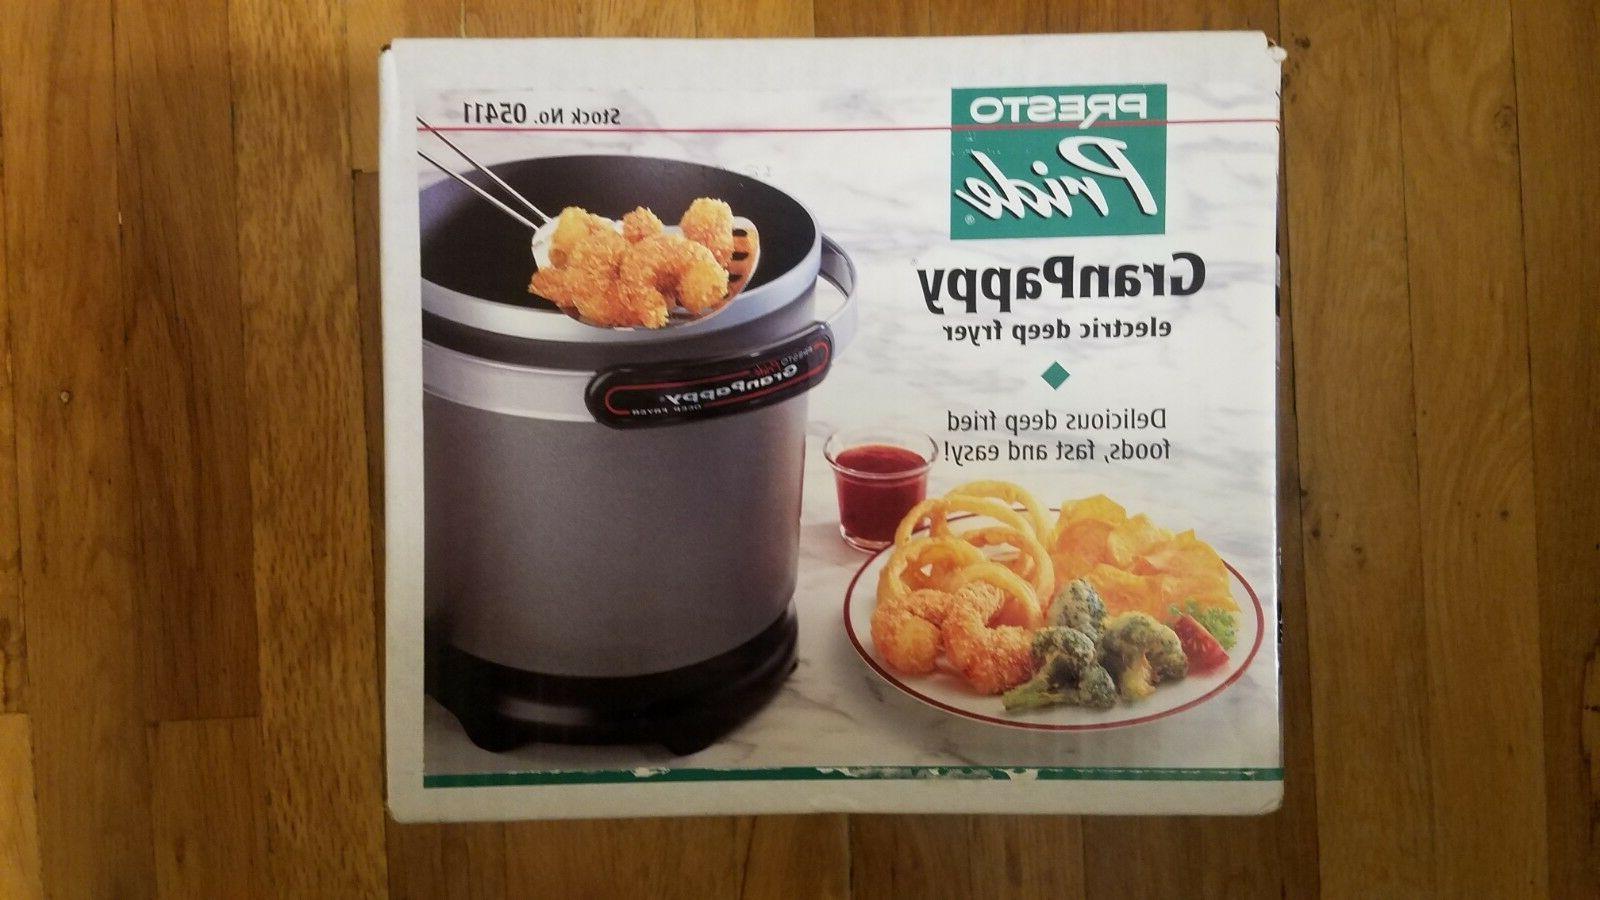 granpappy 05411 deep fryer